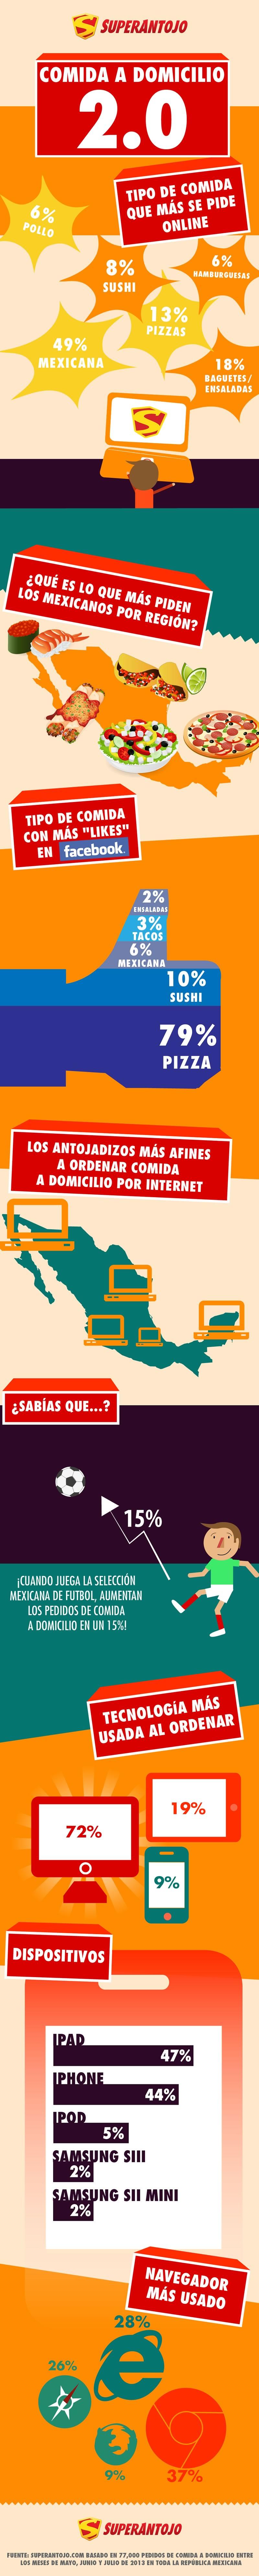 Comida a domicilio por internet en México [Infografía] - Comida-a-domicilio-internet-SuperAntojo